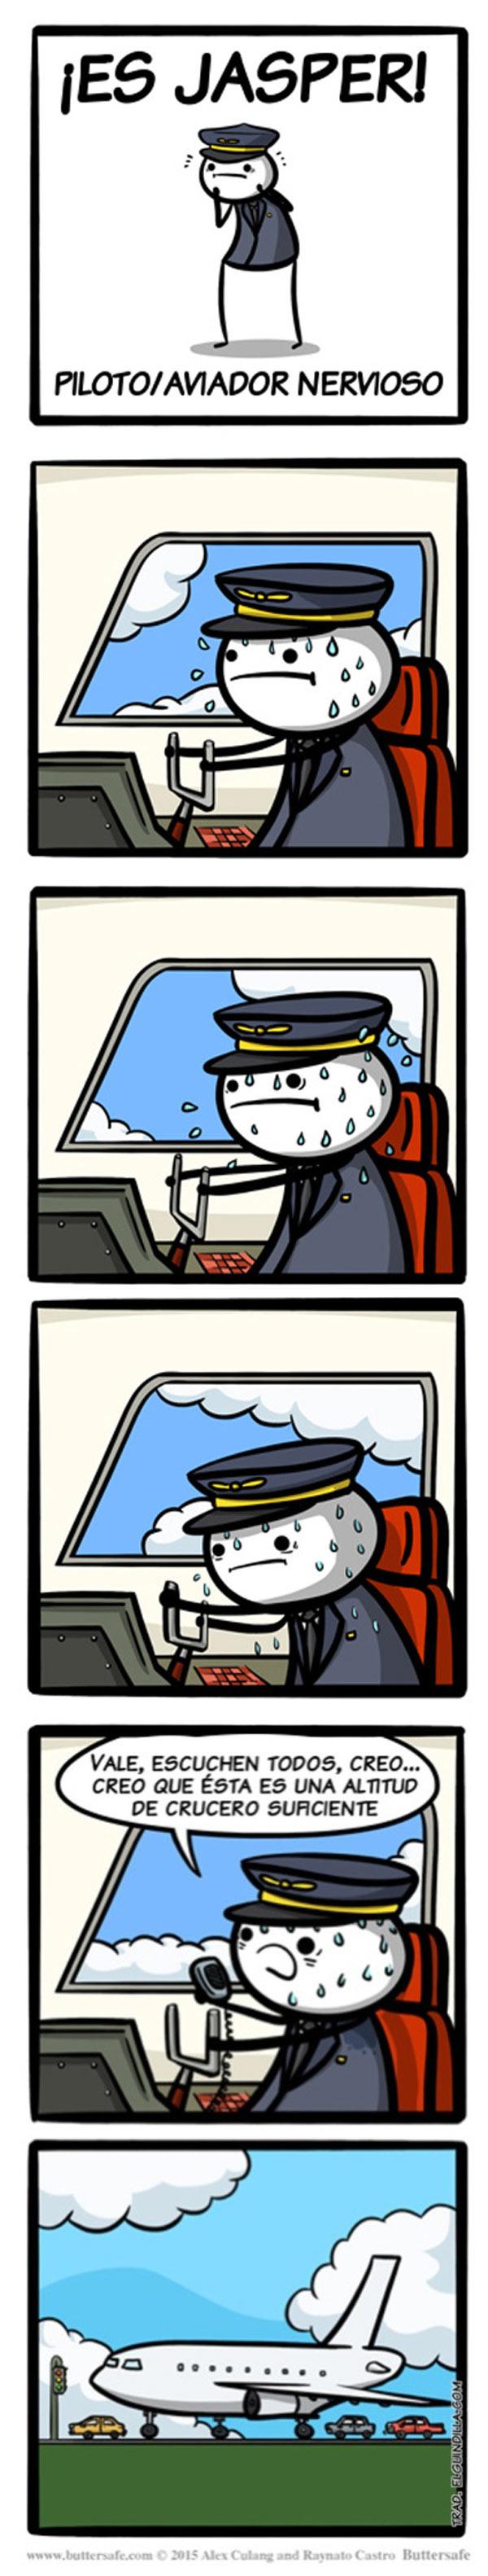 Jasper, el piloto nervioso